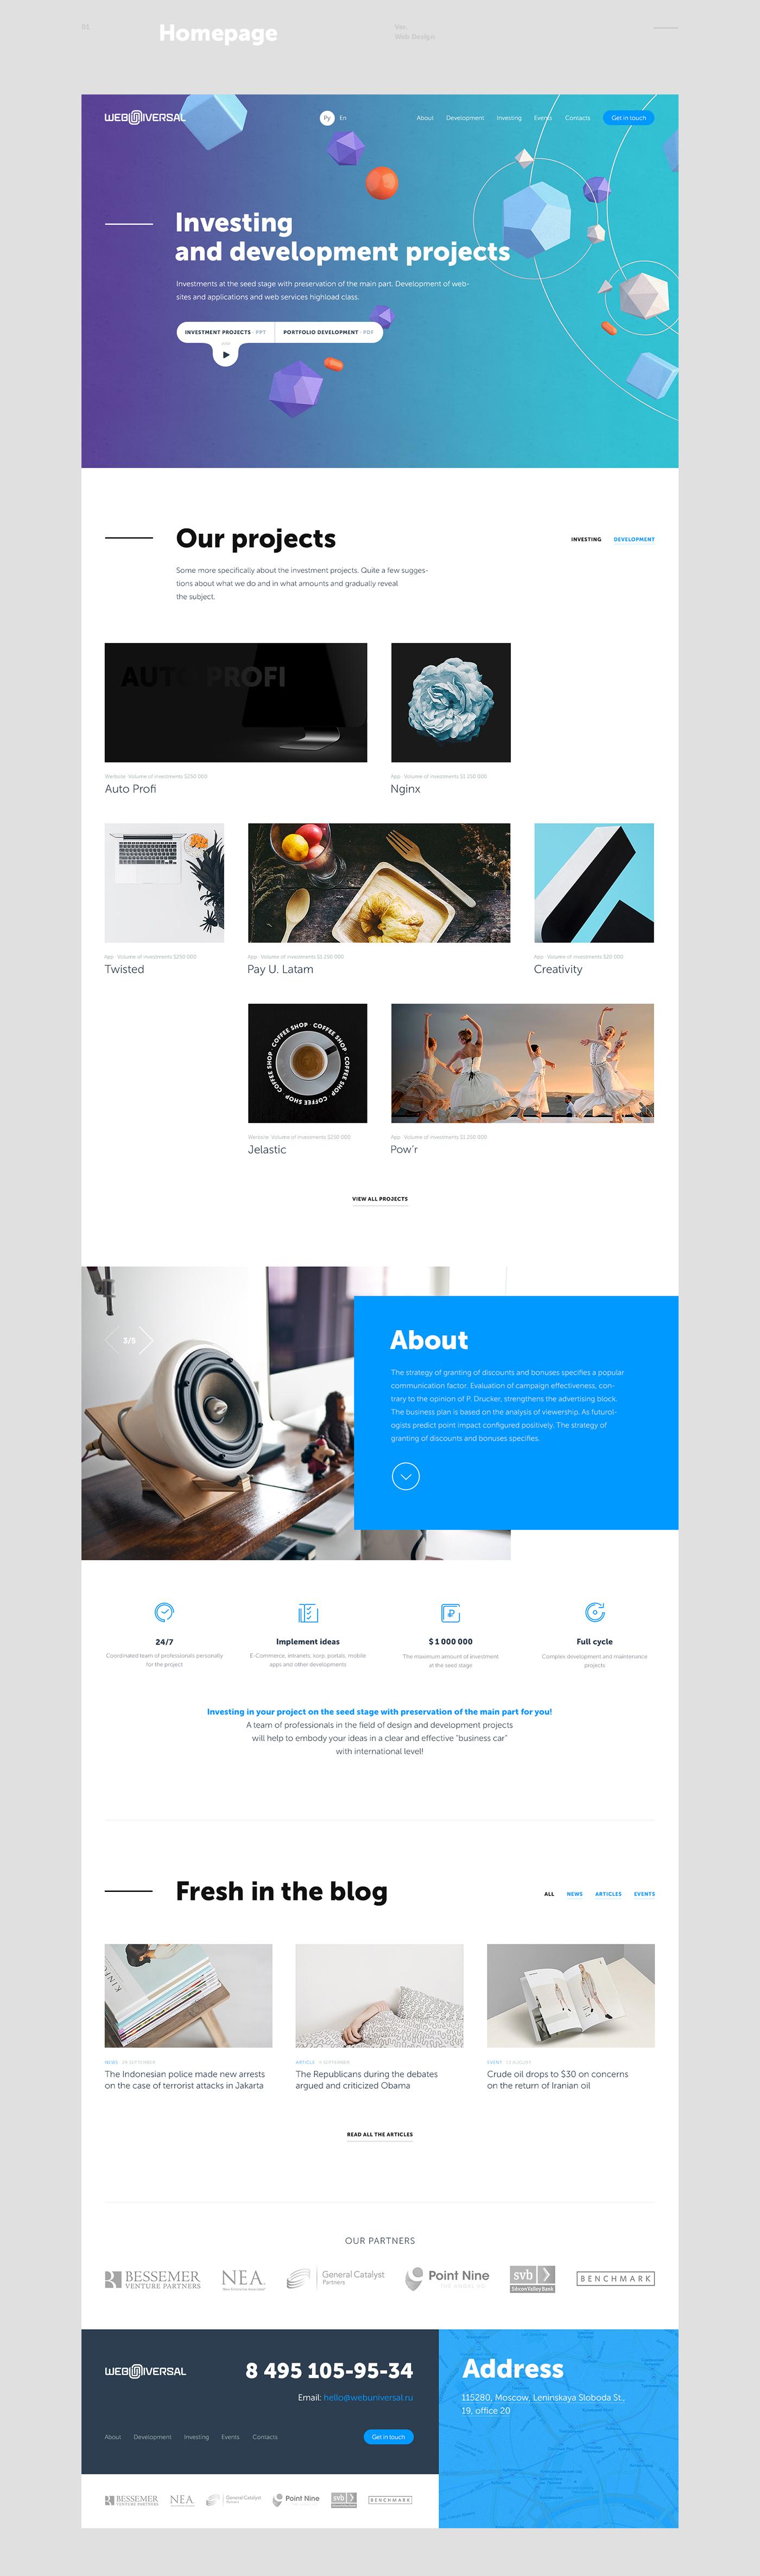 The Website Portfolio Of The Agency Web Universal Portfolio Web Design Agency Website Design Web Template Design